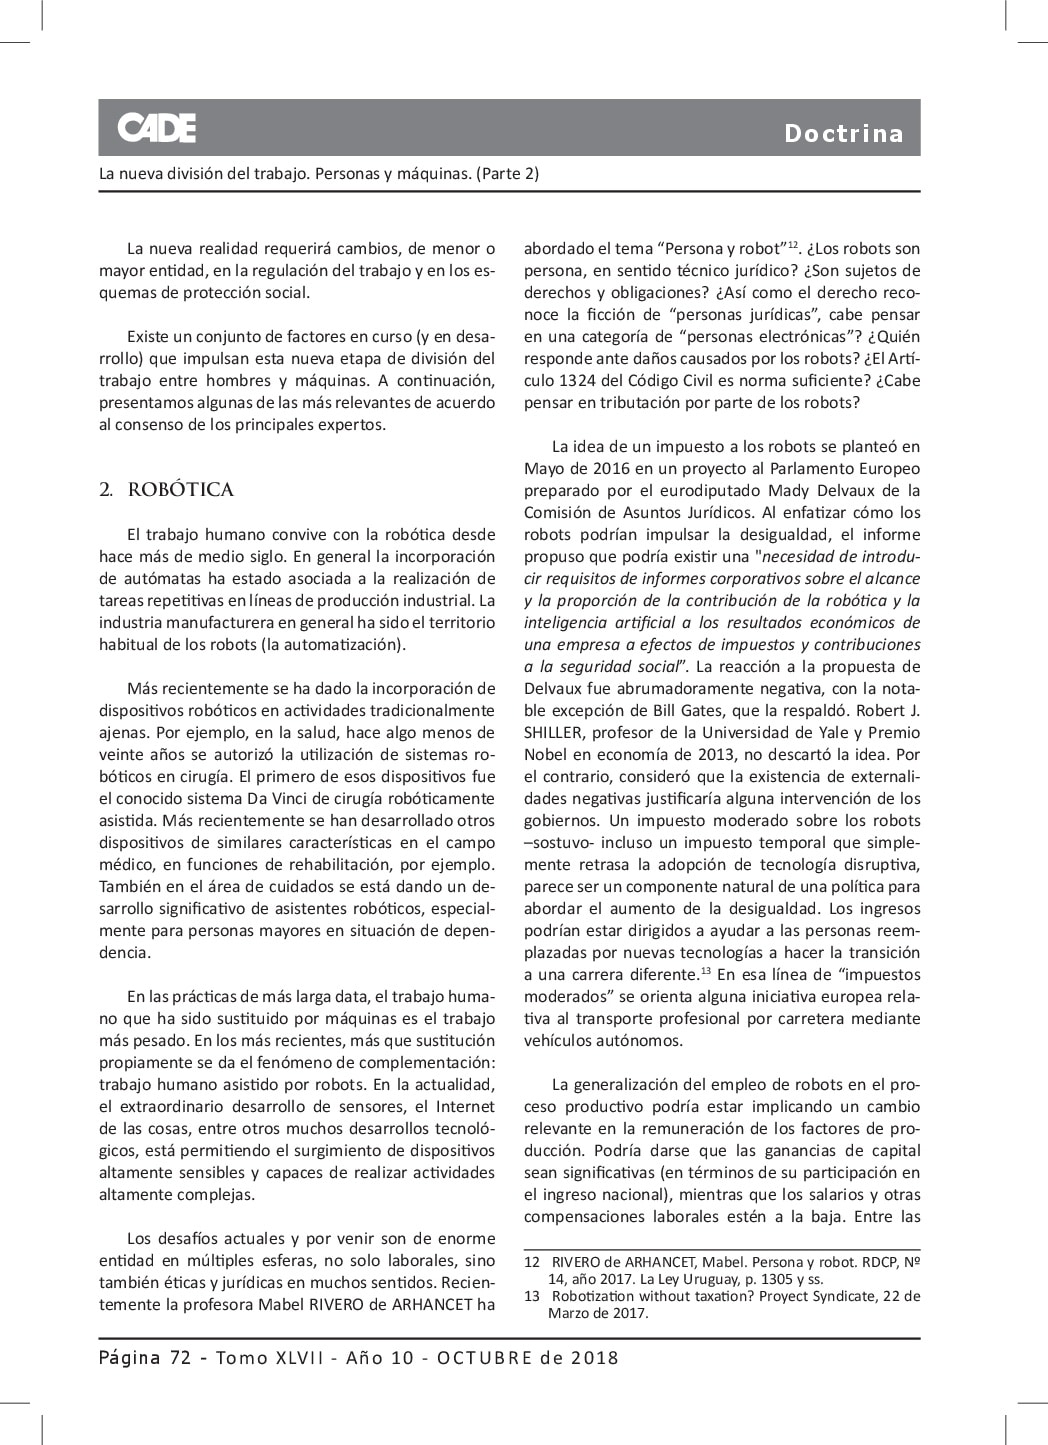 cade-doctrina-jurisprudencia-saldain-004